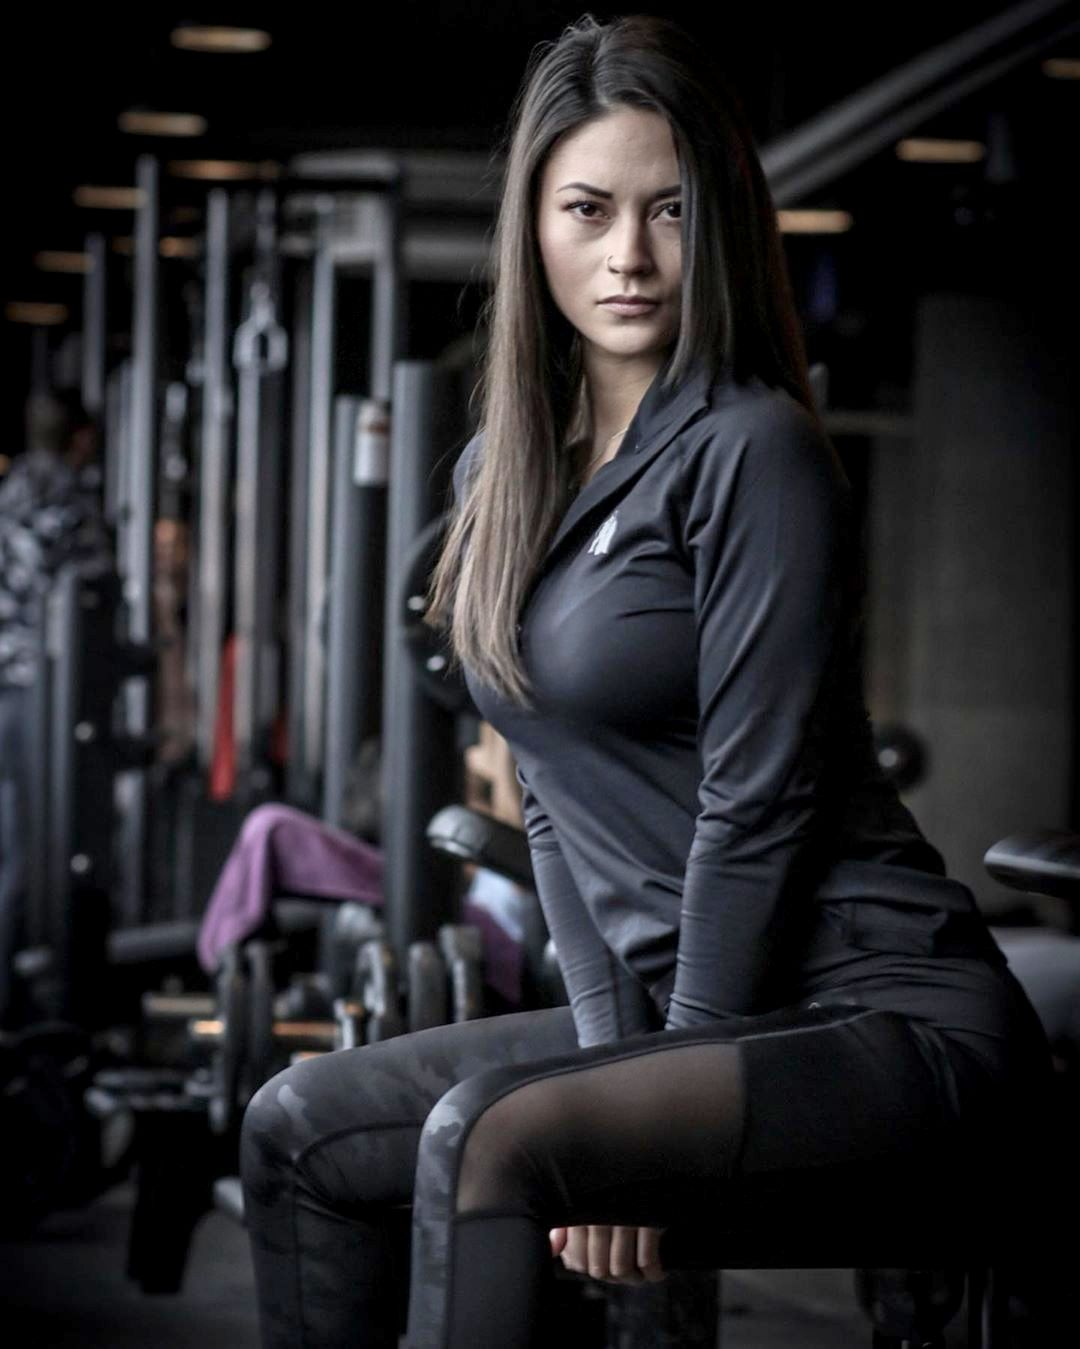 Vietnamese Fitness Model DP